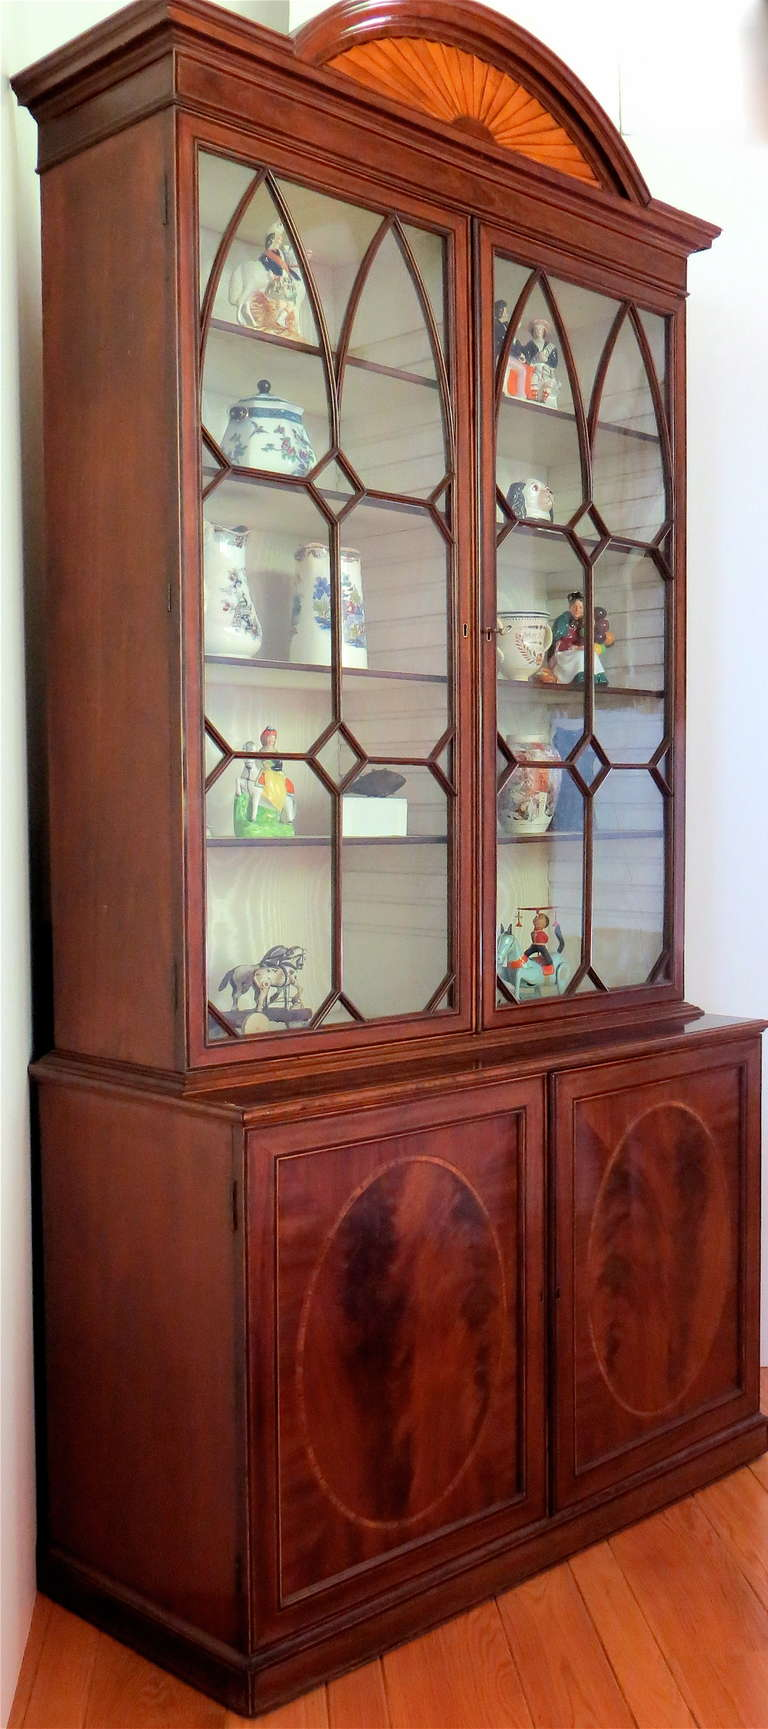 English George III Mahogany Bookcase, circa 1785 For Sale